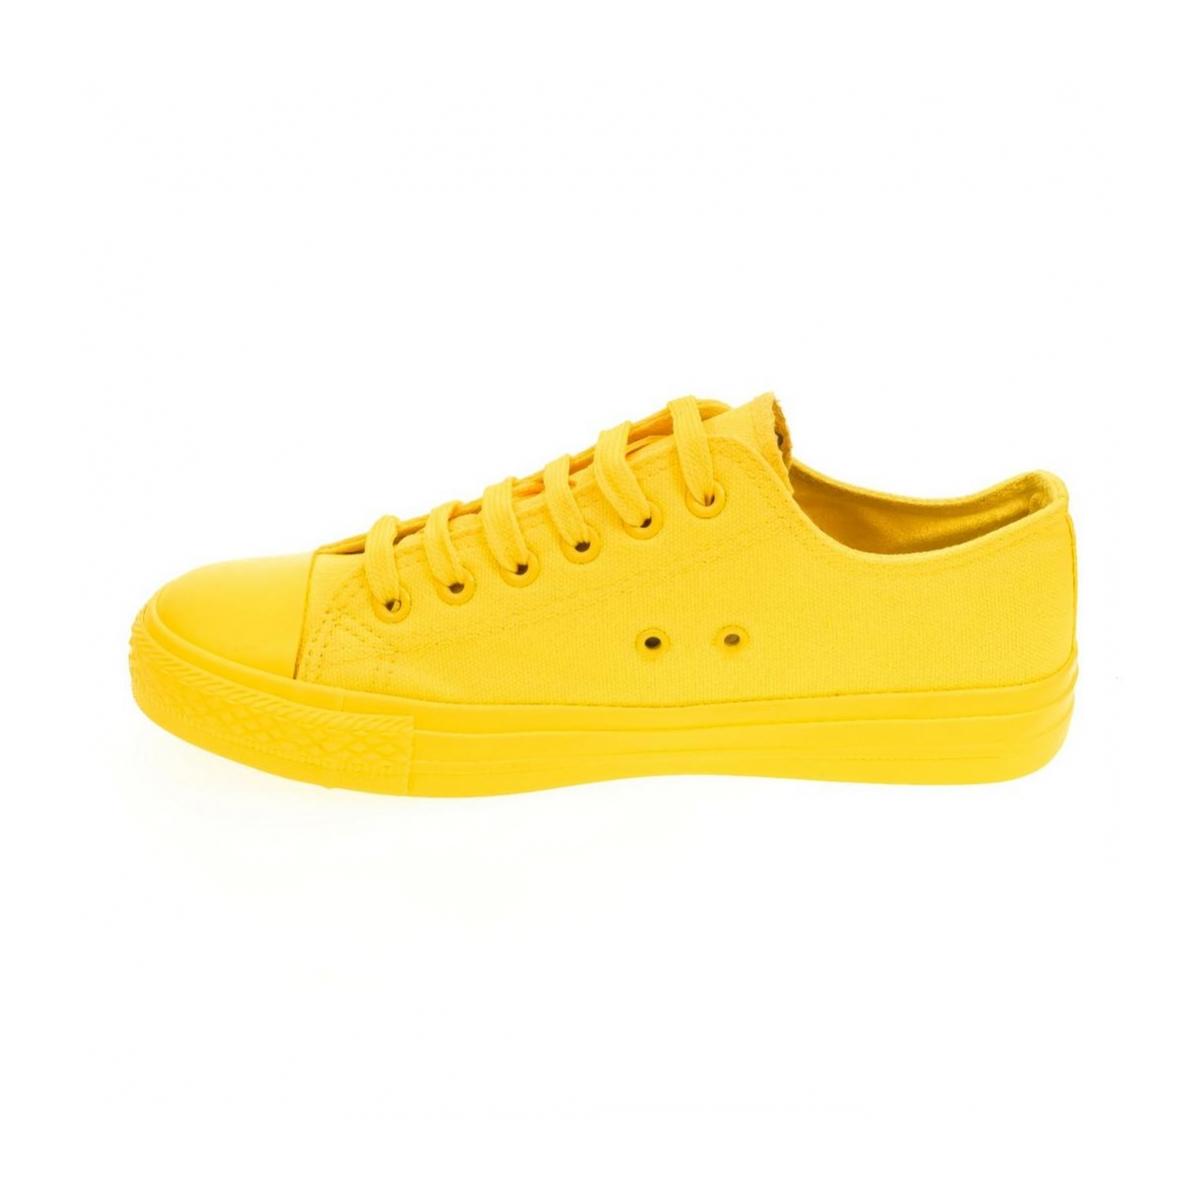 b9891f7996 Dámske žlté tenisky REINA - 5